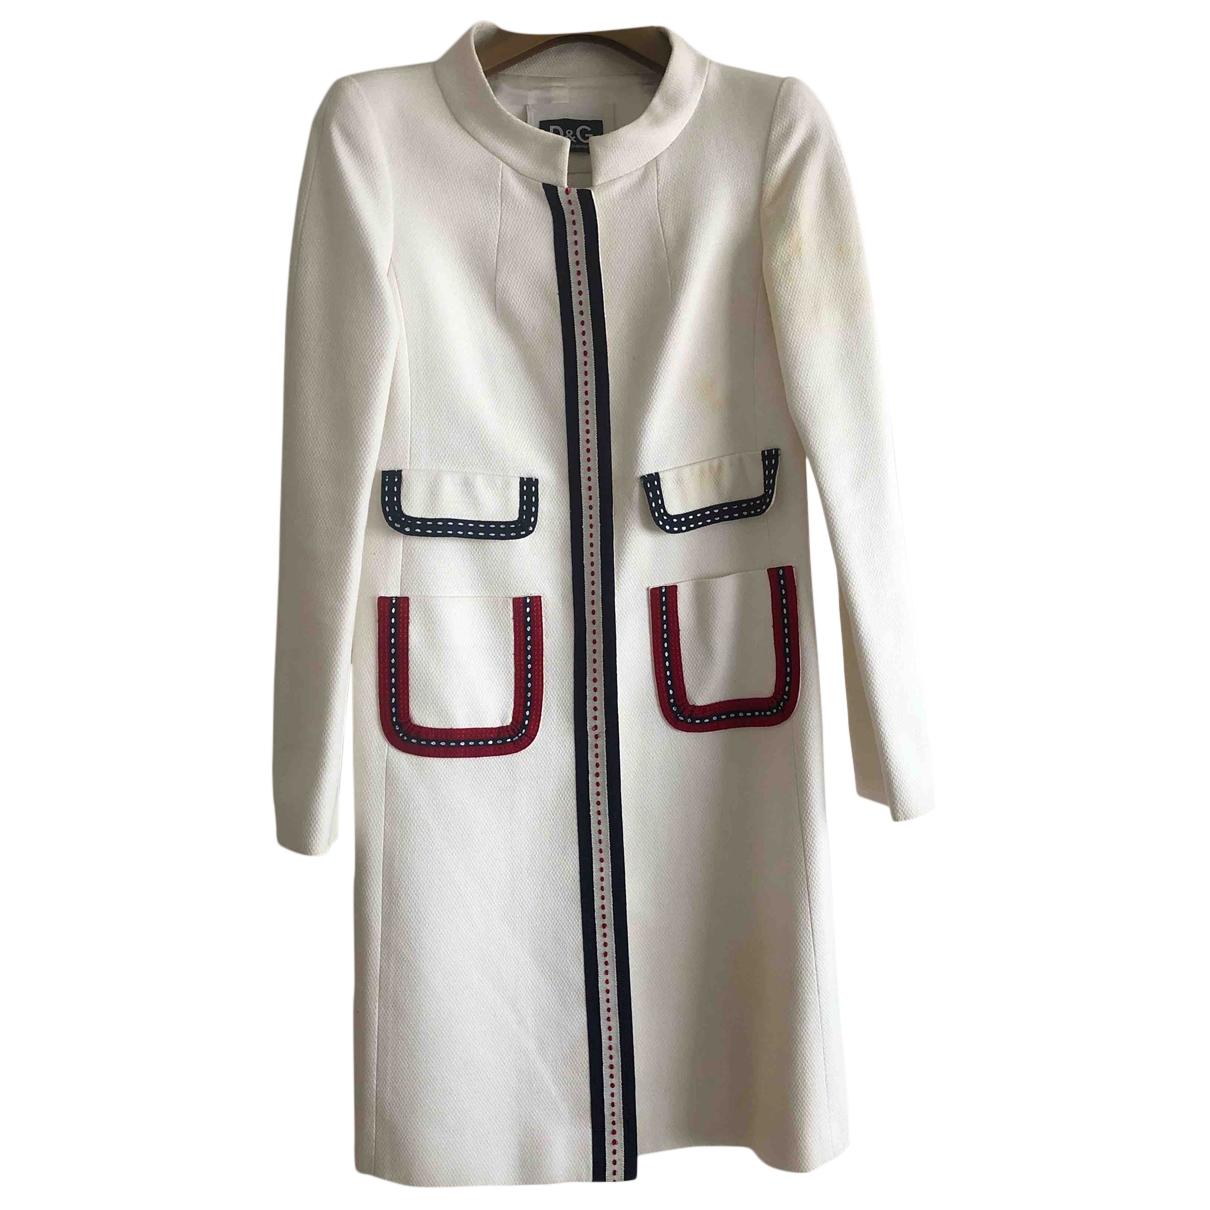 D&g \N White Cotton coat for Women 38 IT